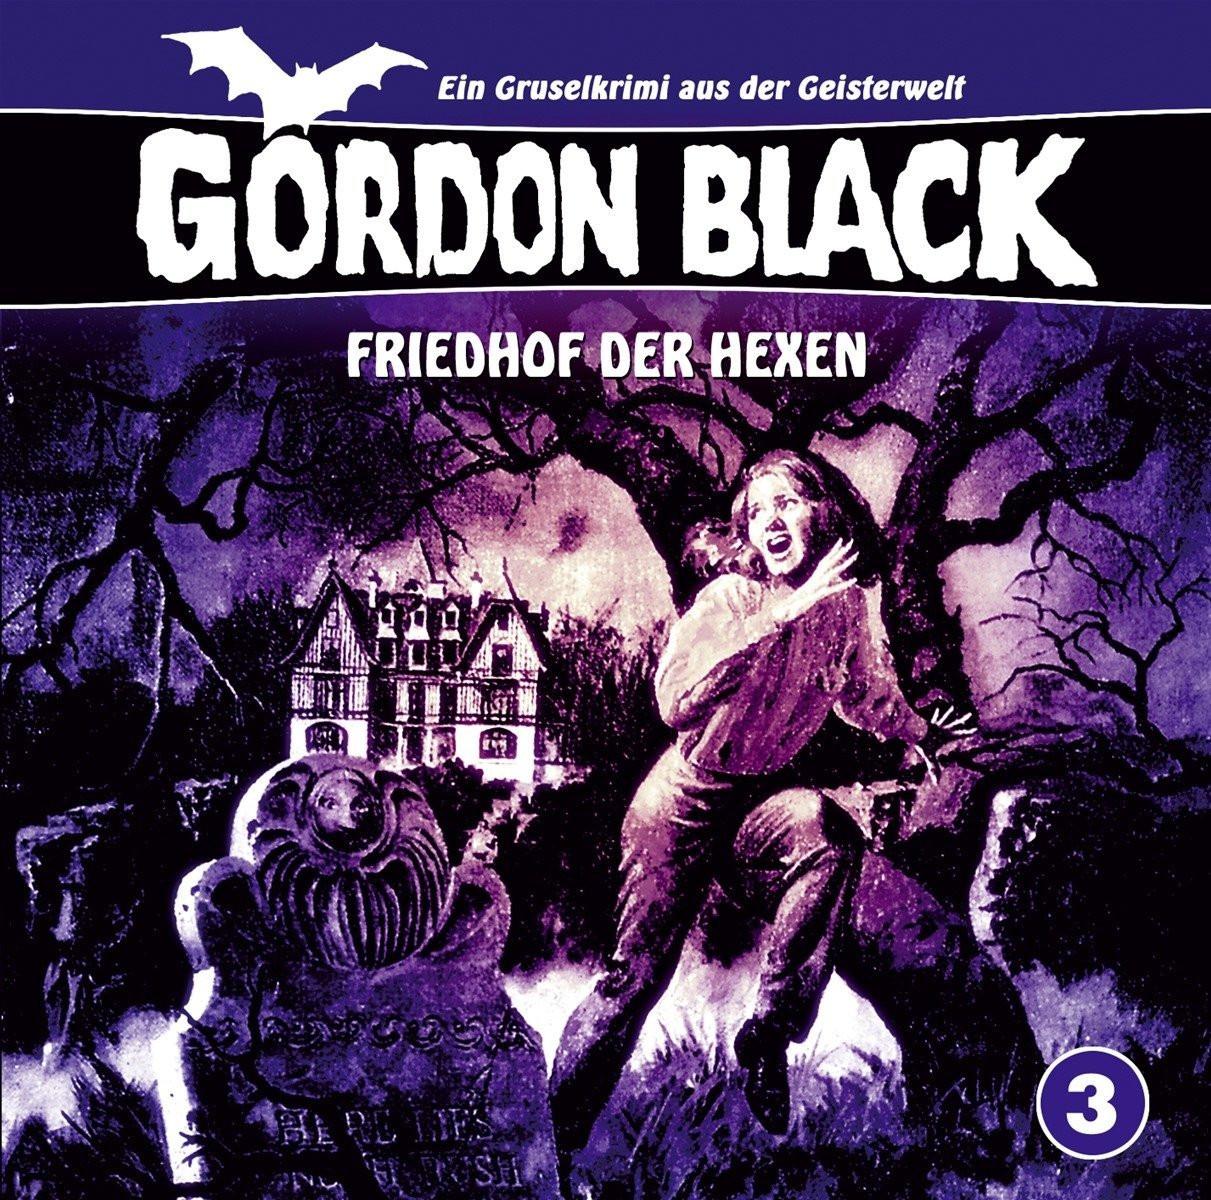 Gordon Black - Folge 3: Friedhof der Hexen